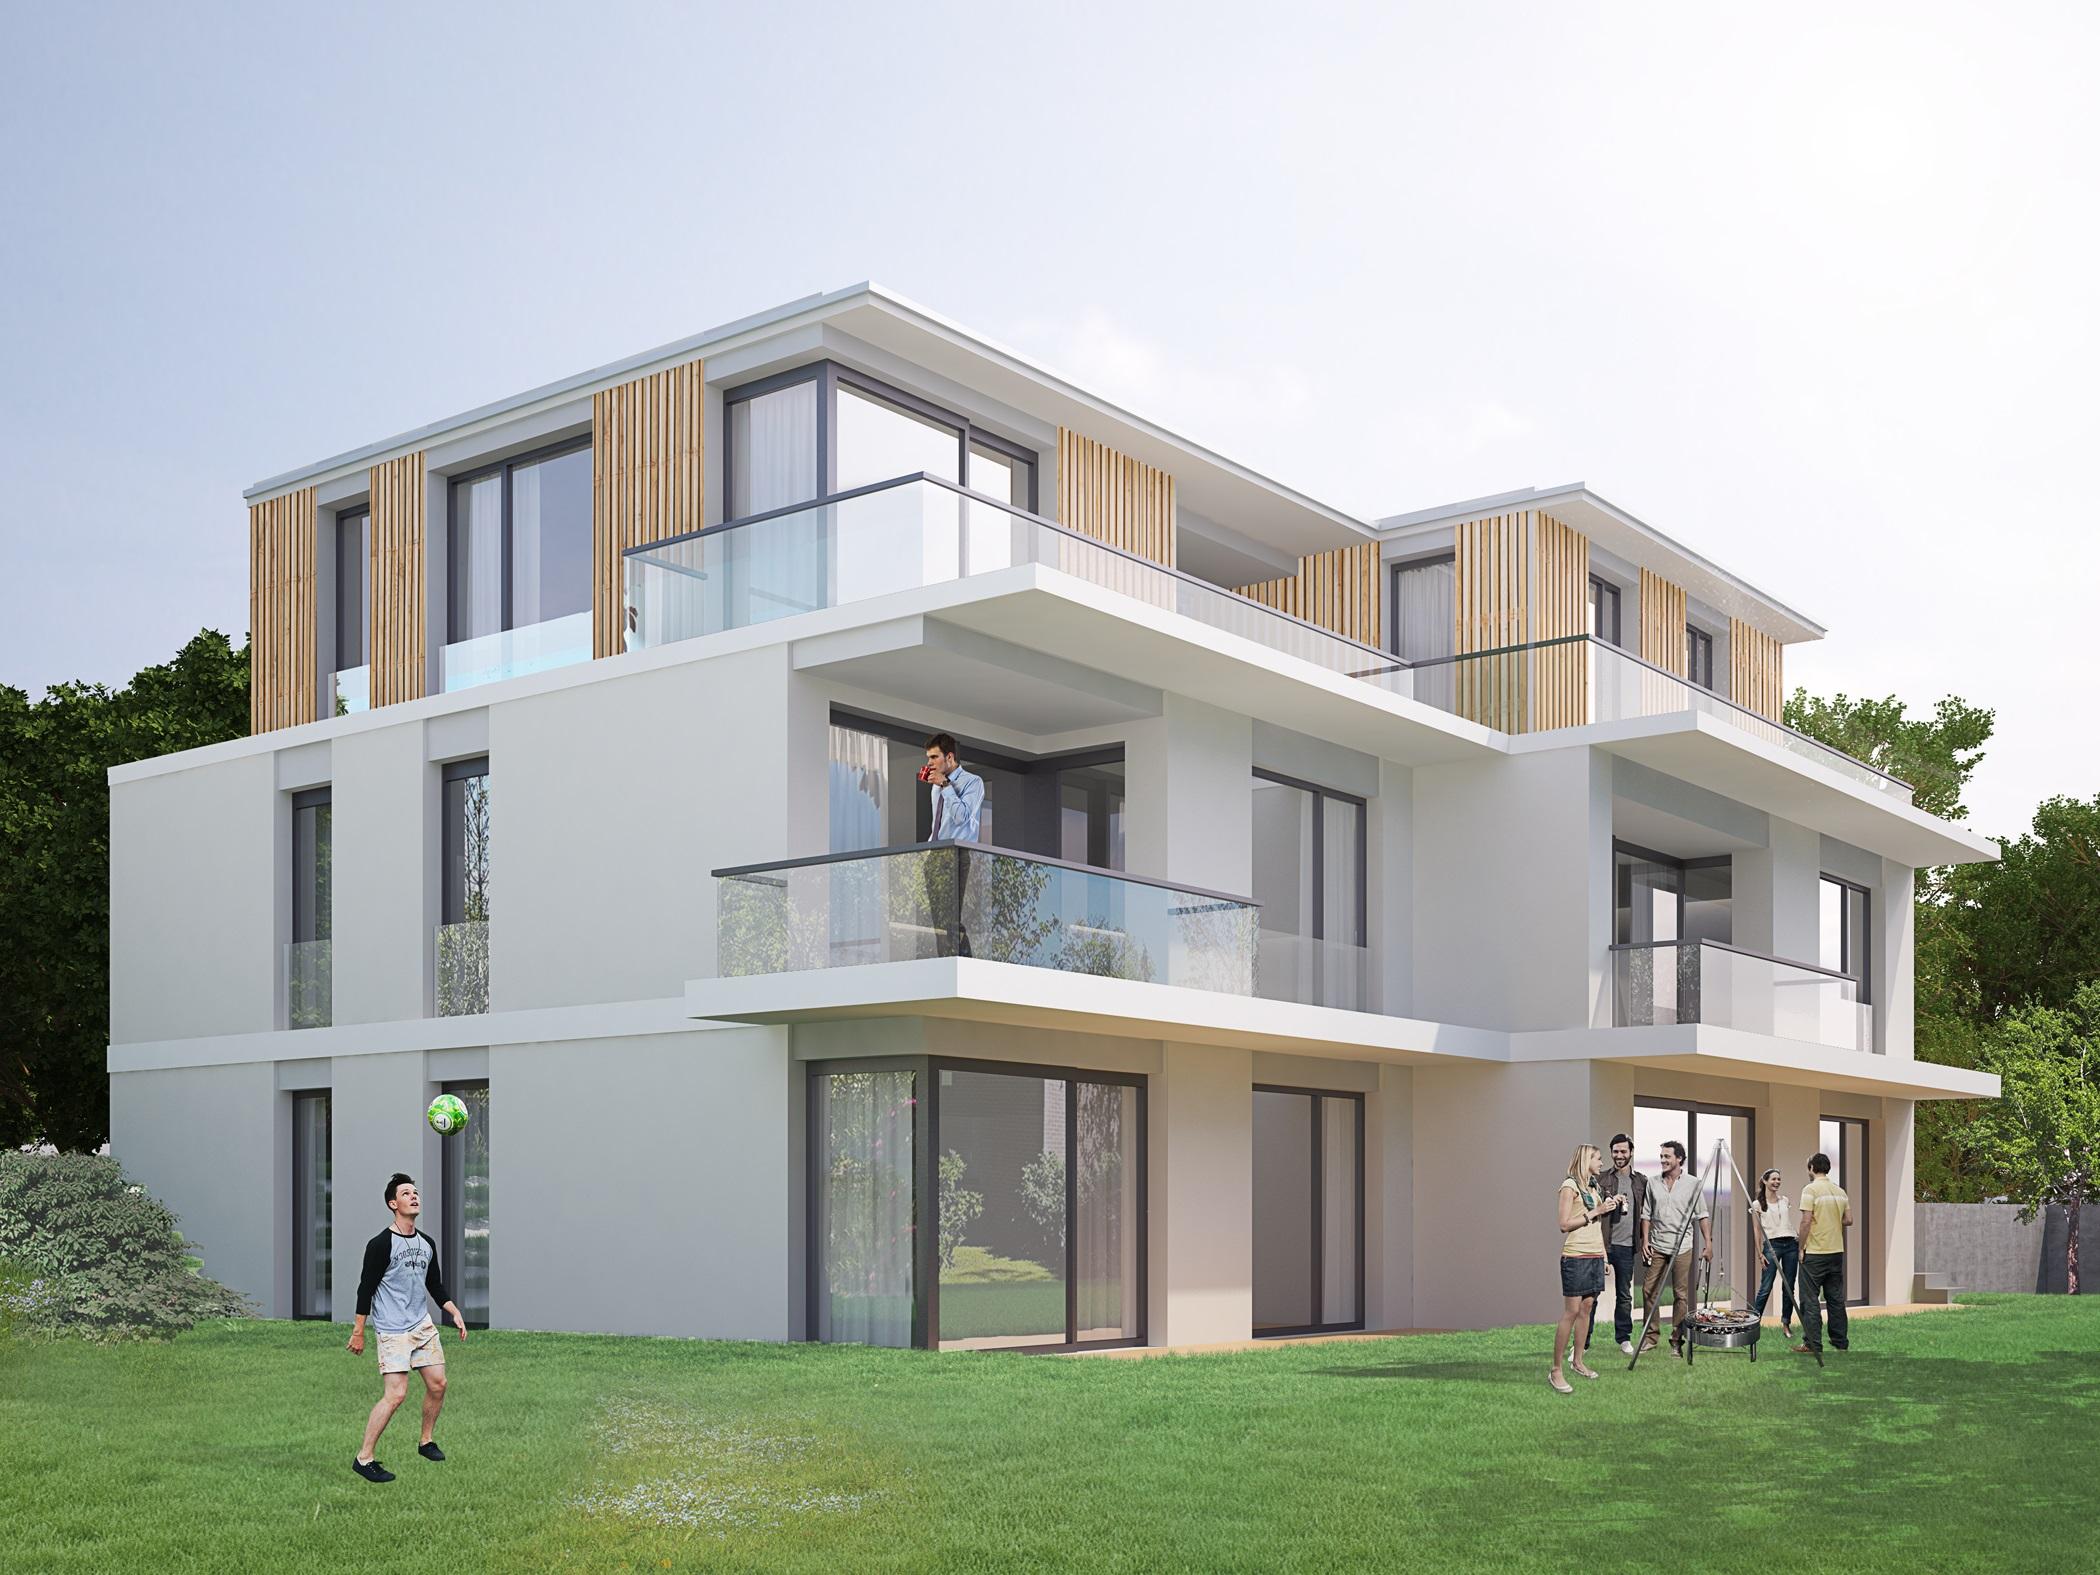 mehrfamilienhaus dortmund holzen zed baugesellschaft mbh. Black Bedroom Furniture Sets. Home Design Ideas